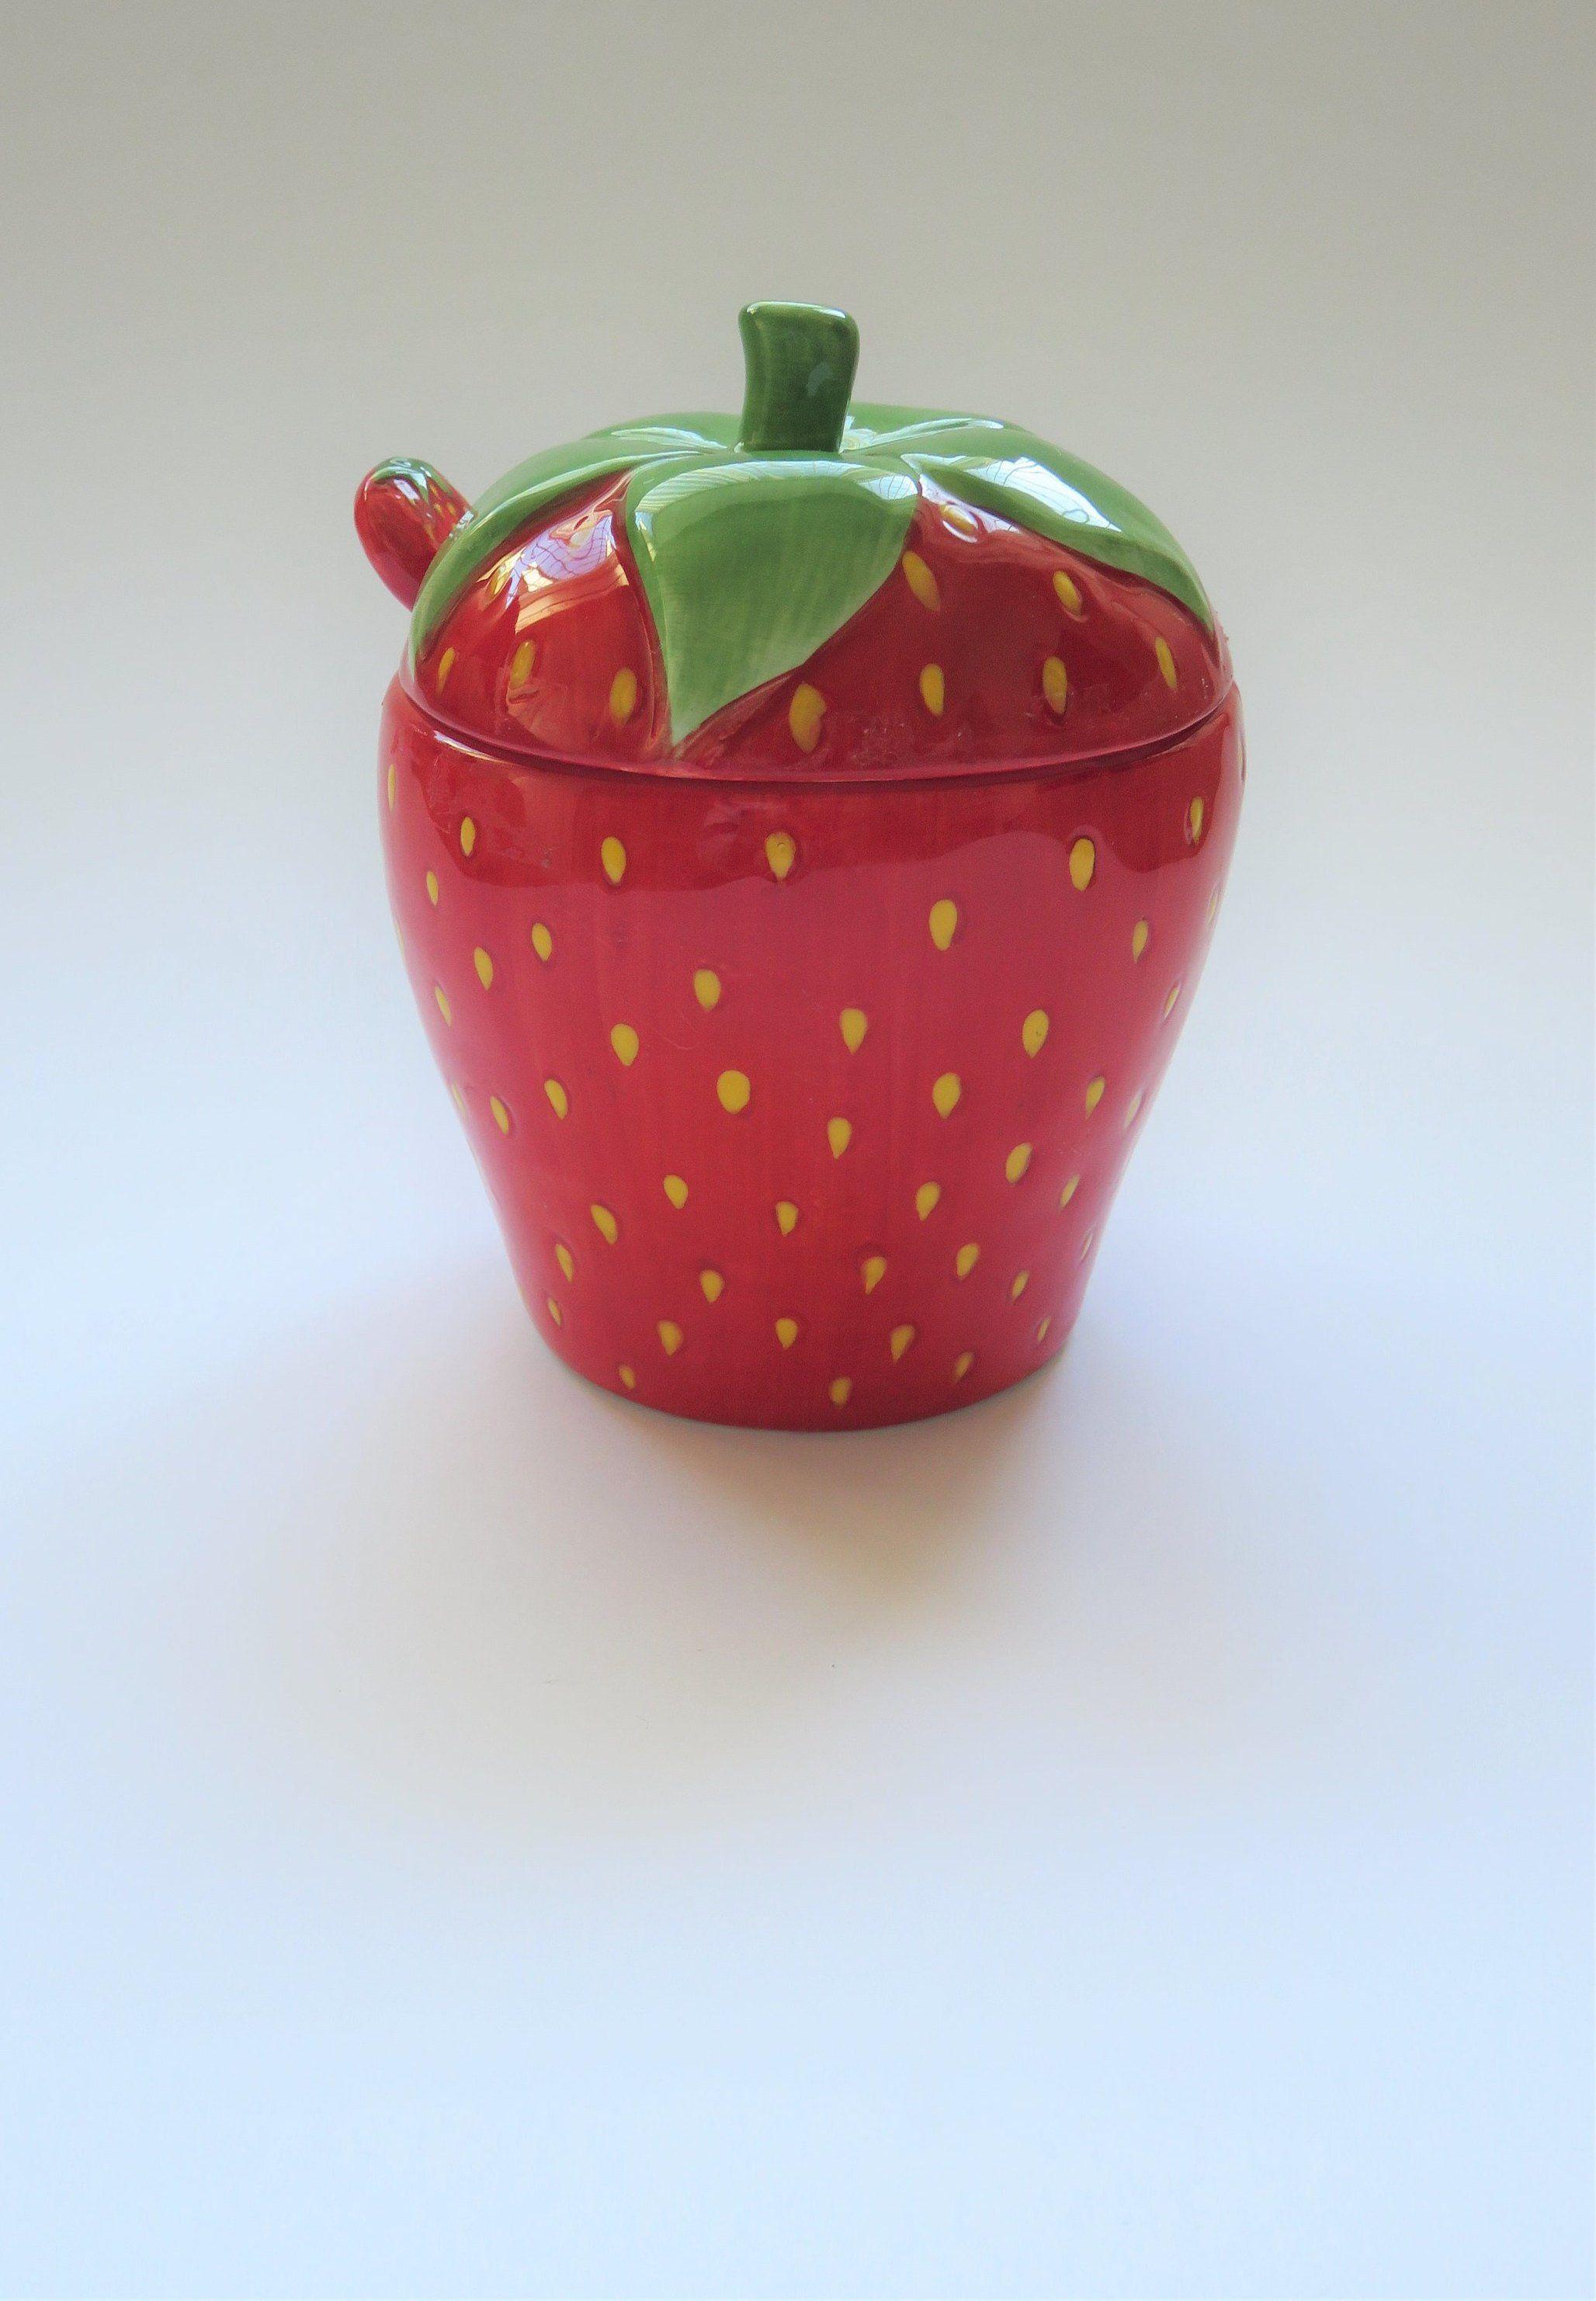 Retro Strawberry Shaped Preserve Jar And Spoon Jam Jelly Conserve Ceramic Pot Ceramic Pot Christmas Plates Ceramic Art